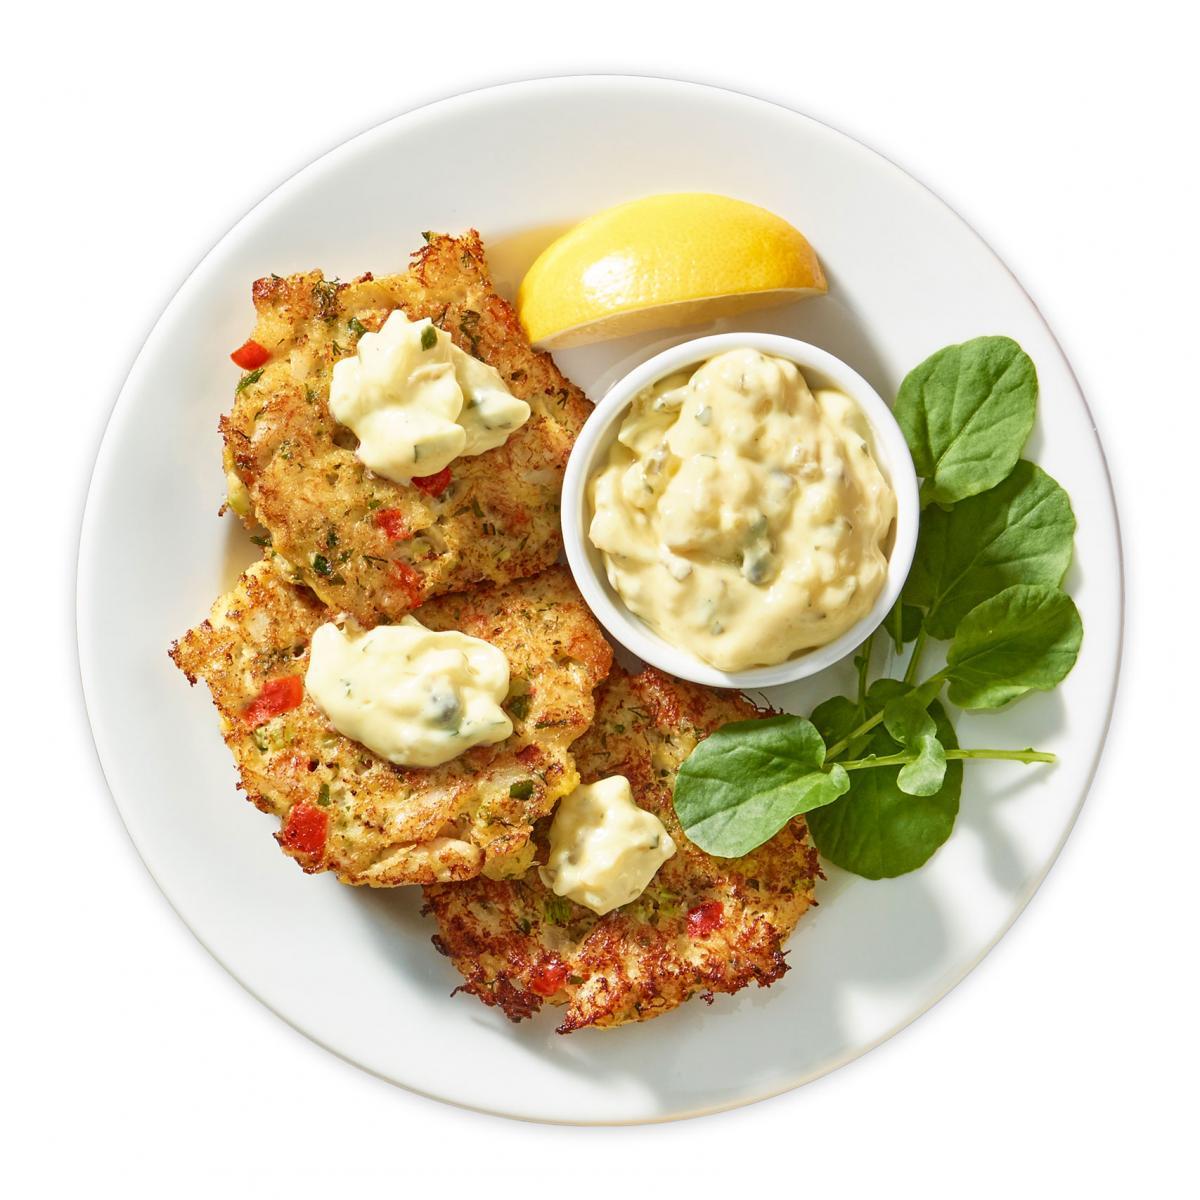 Lemon Sauce For Crab Cakes Recipe